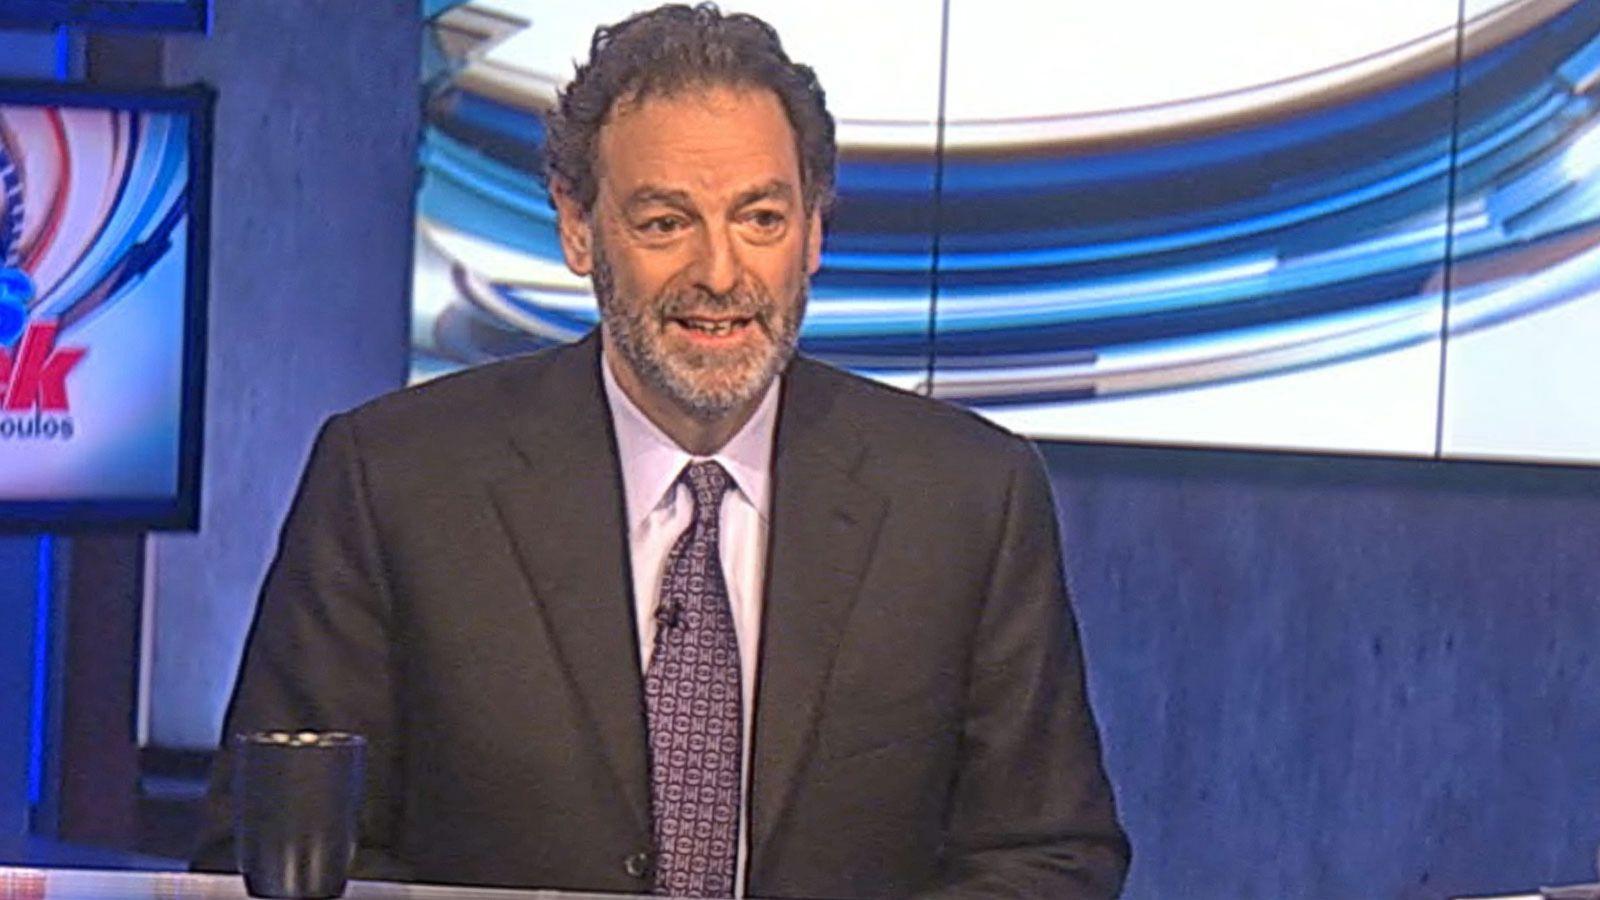 VIDEO: Joel Benenson on 2016 Presidential Race